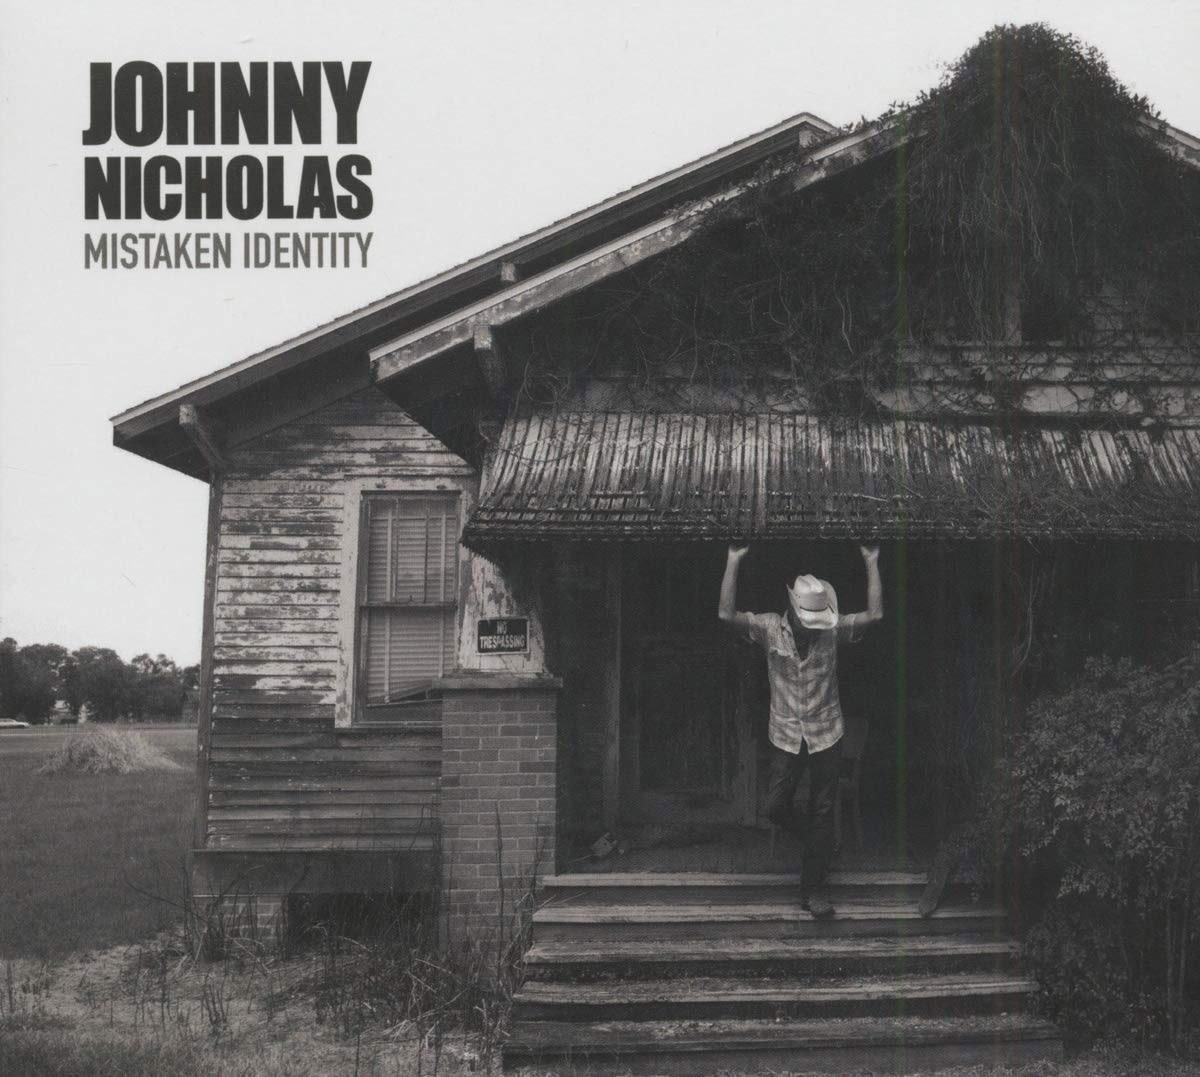 Johnny Nicholas Mistaken Identity